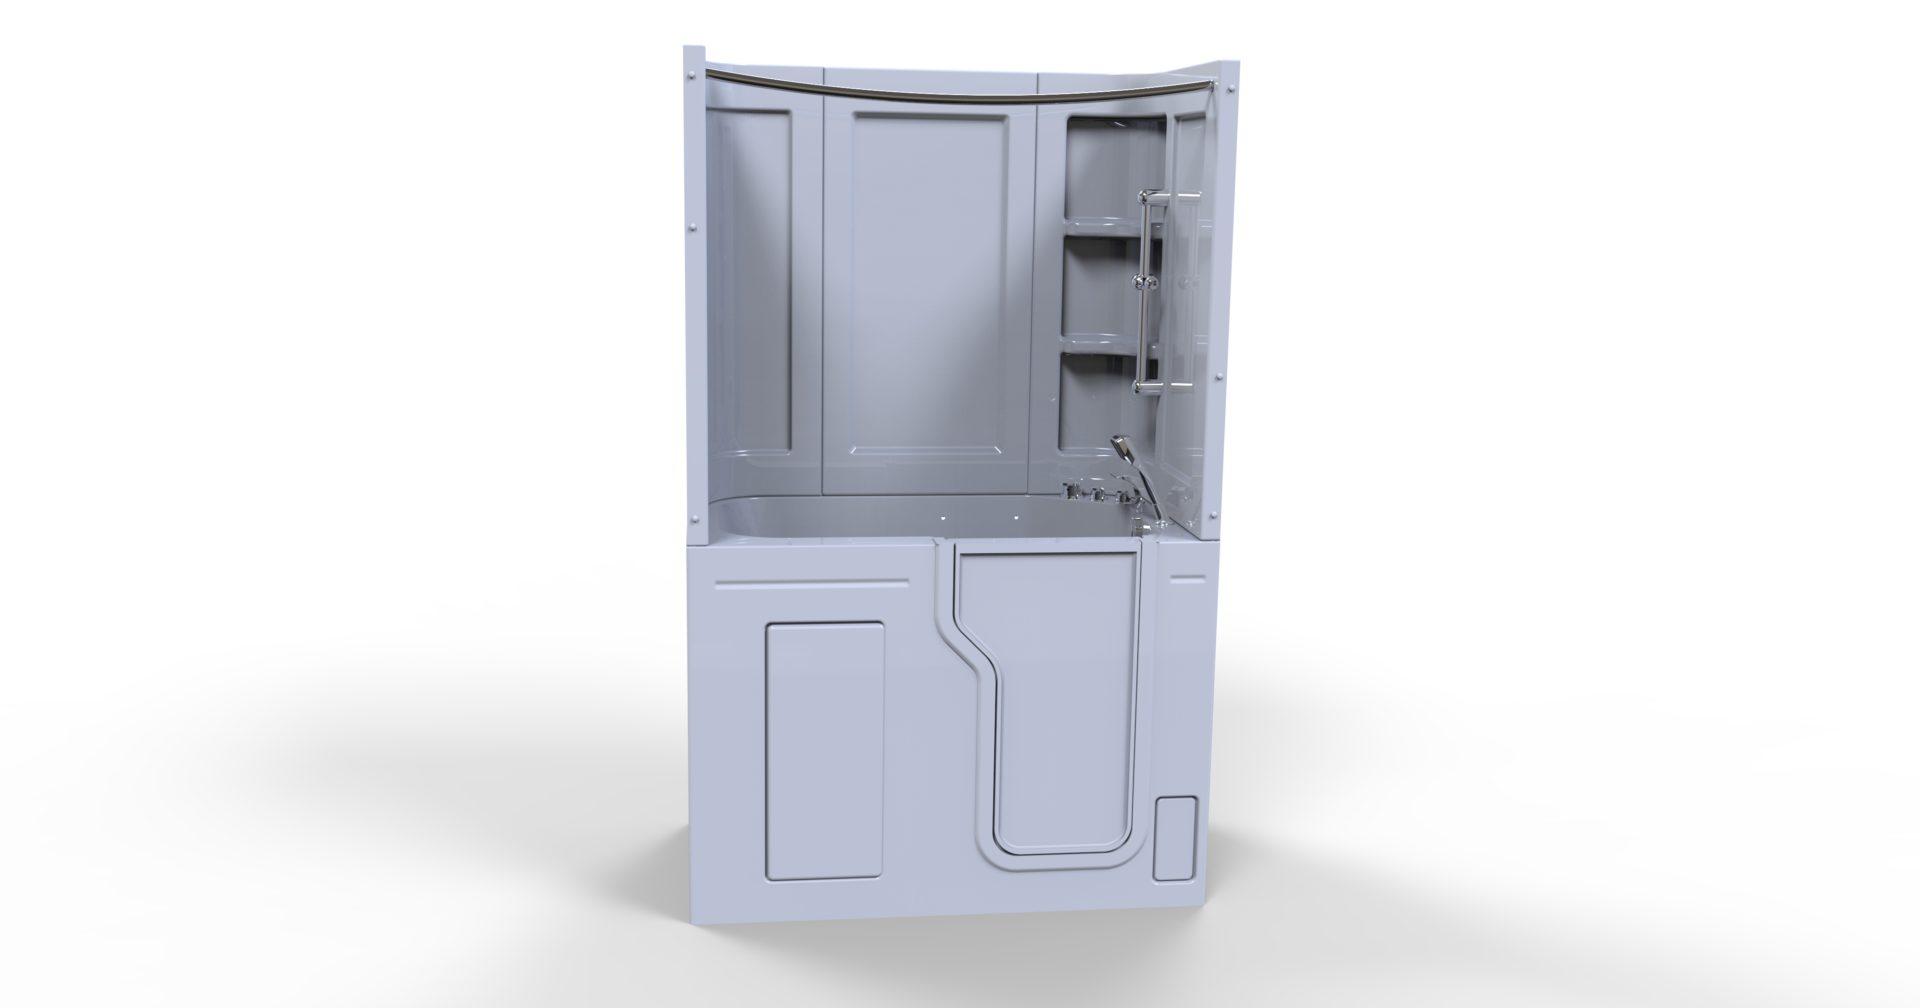 3d model of Fairmount walk-in bathtub, door closed, no water, with installed shower walls